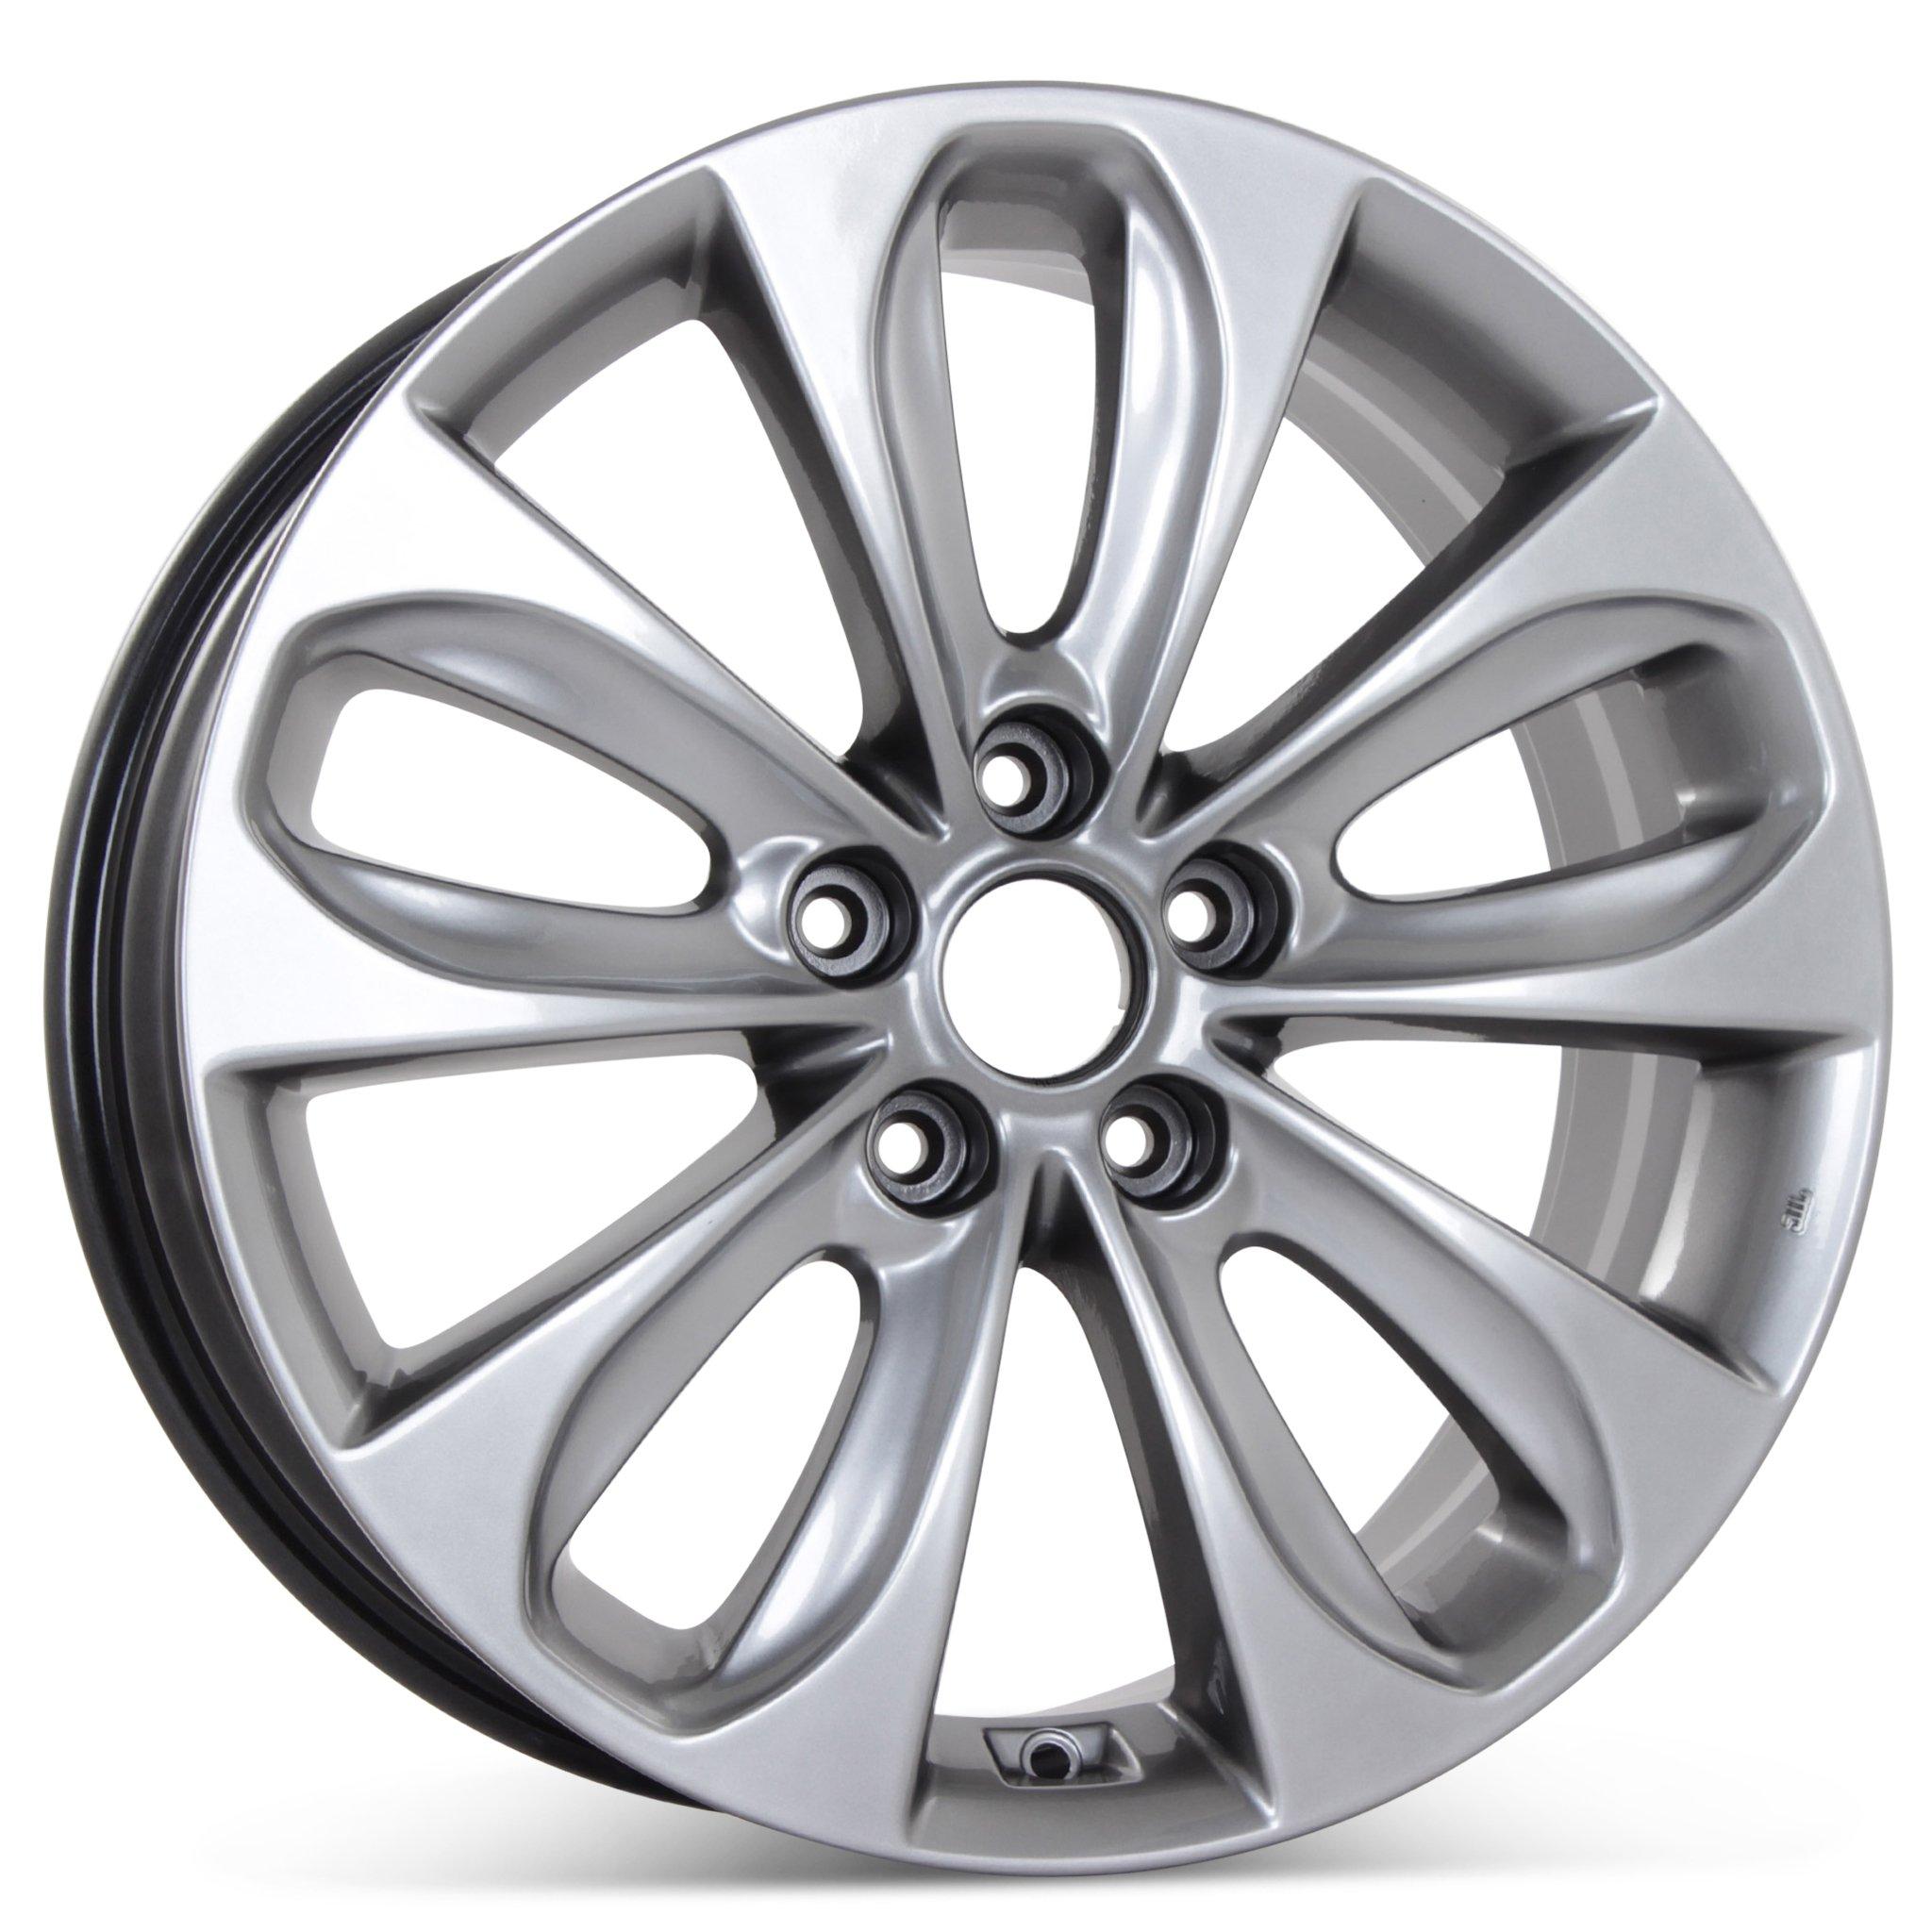 New 18'' x 7.5'' Alloy Replacement Wheel for Hyundai Sonata 2011 2012 2013 Rim 70804